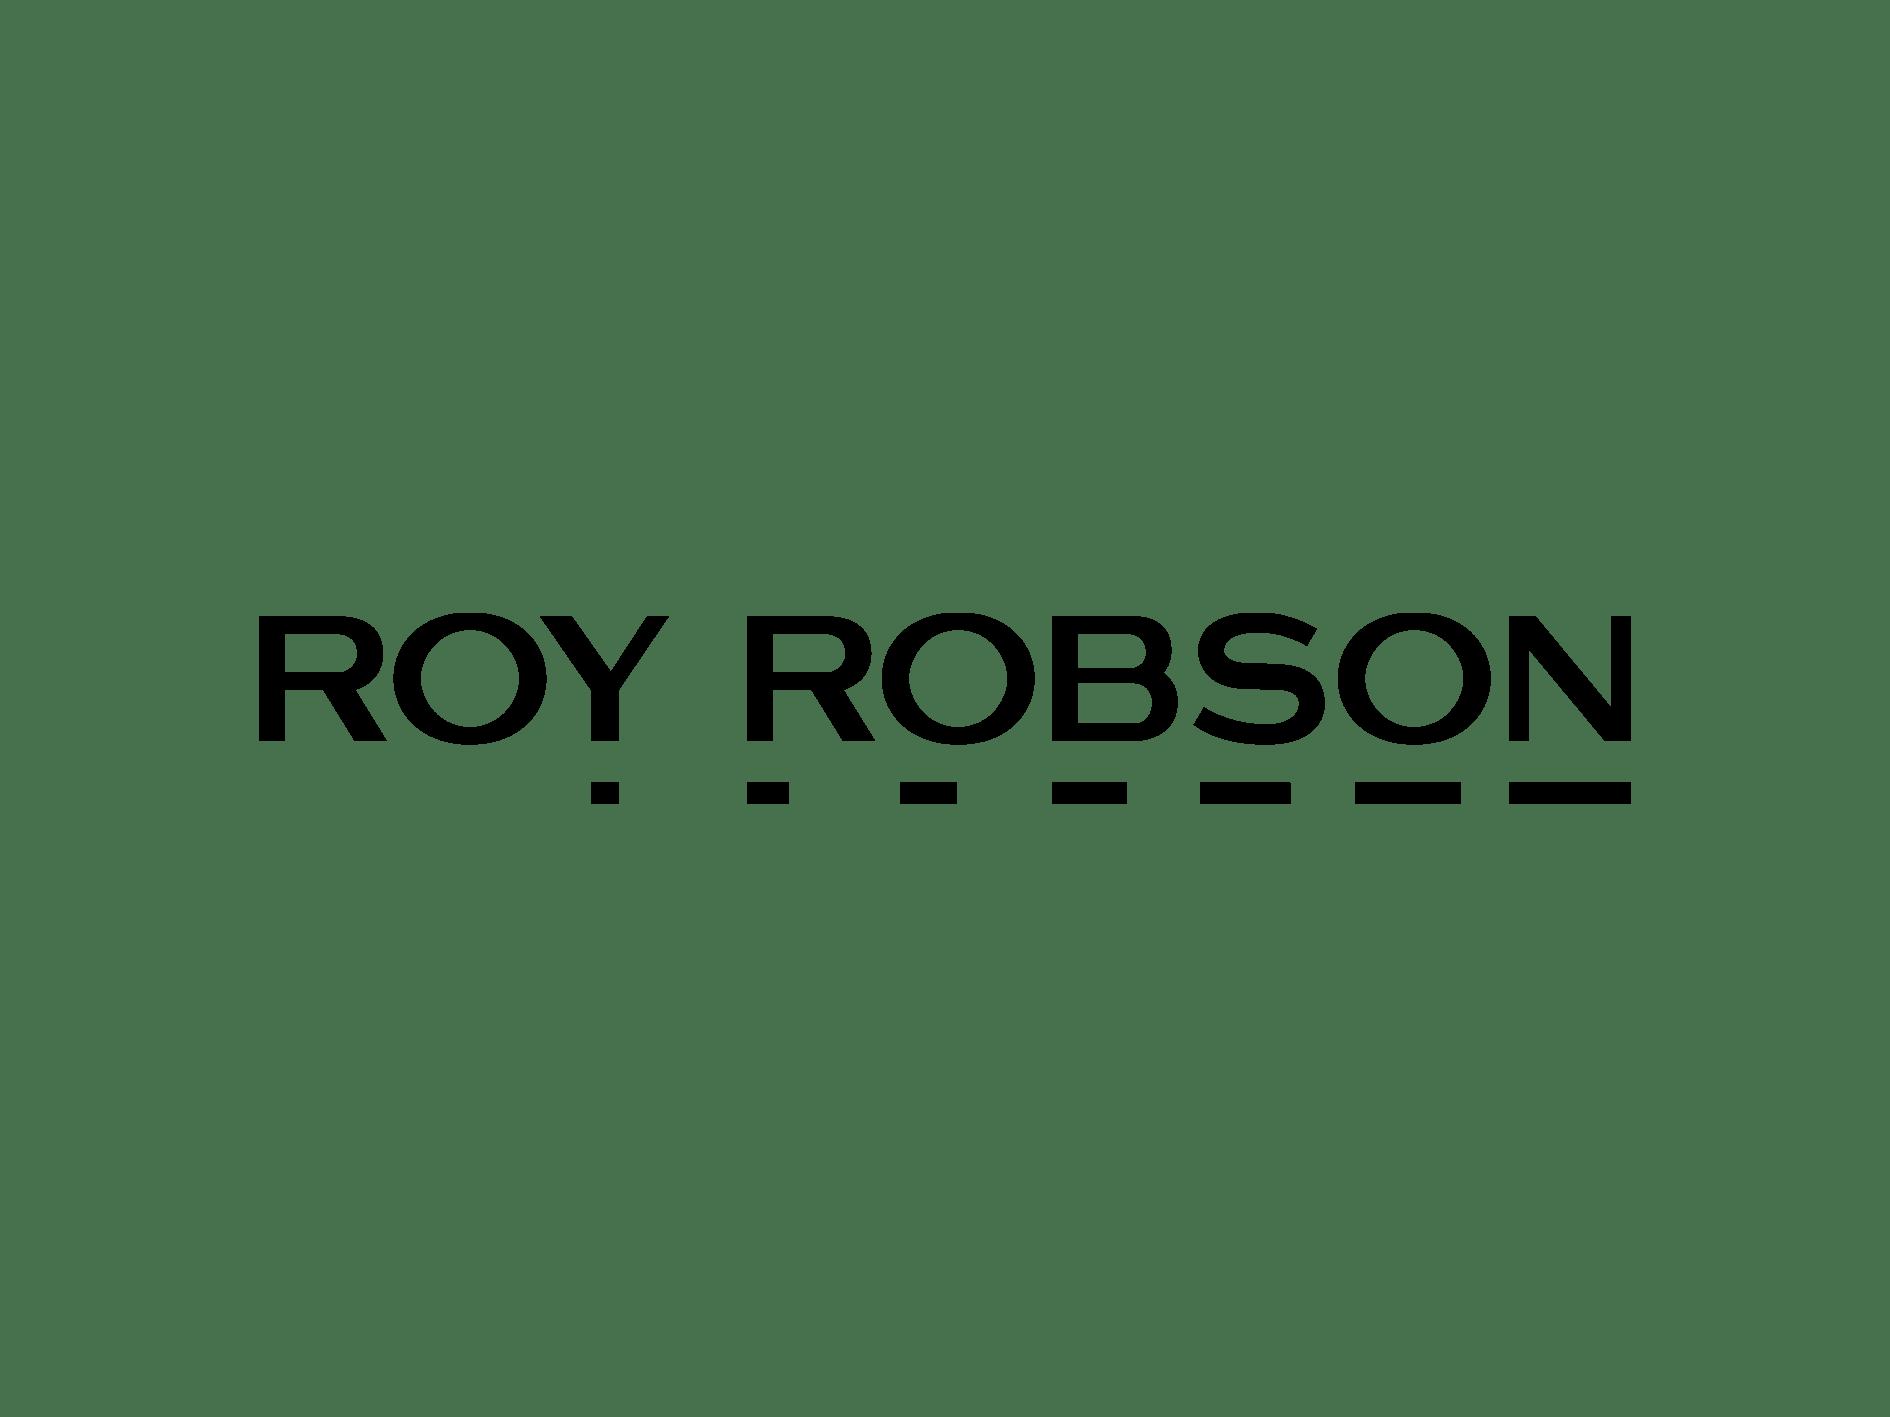 ROY ROBSON  - kiev.karavan.com.ua